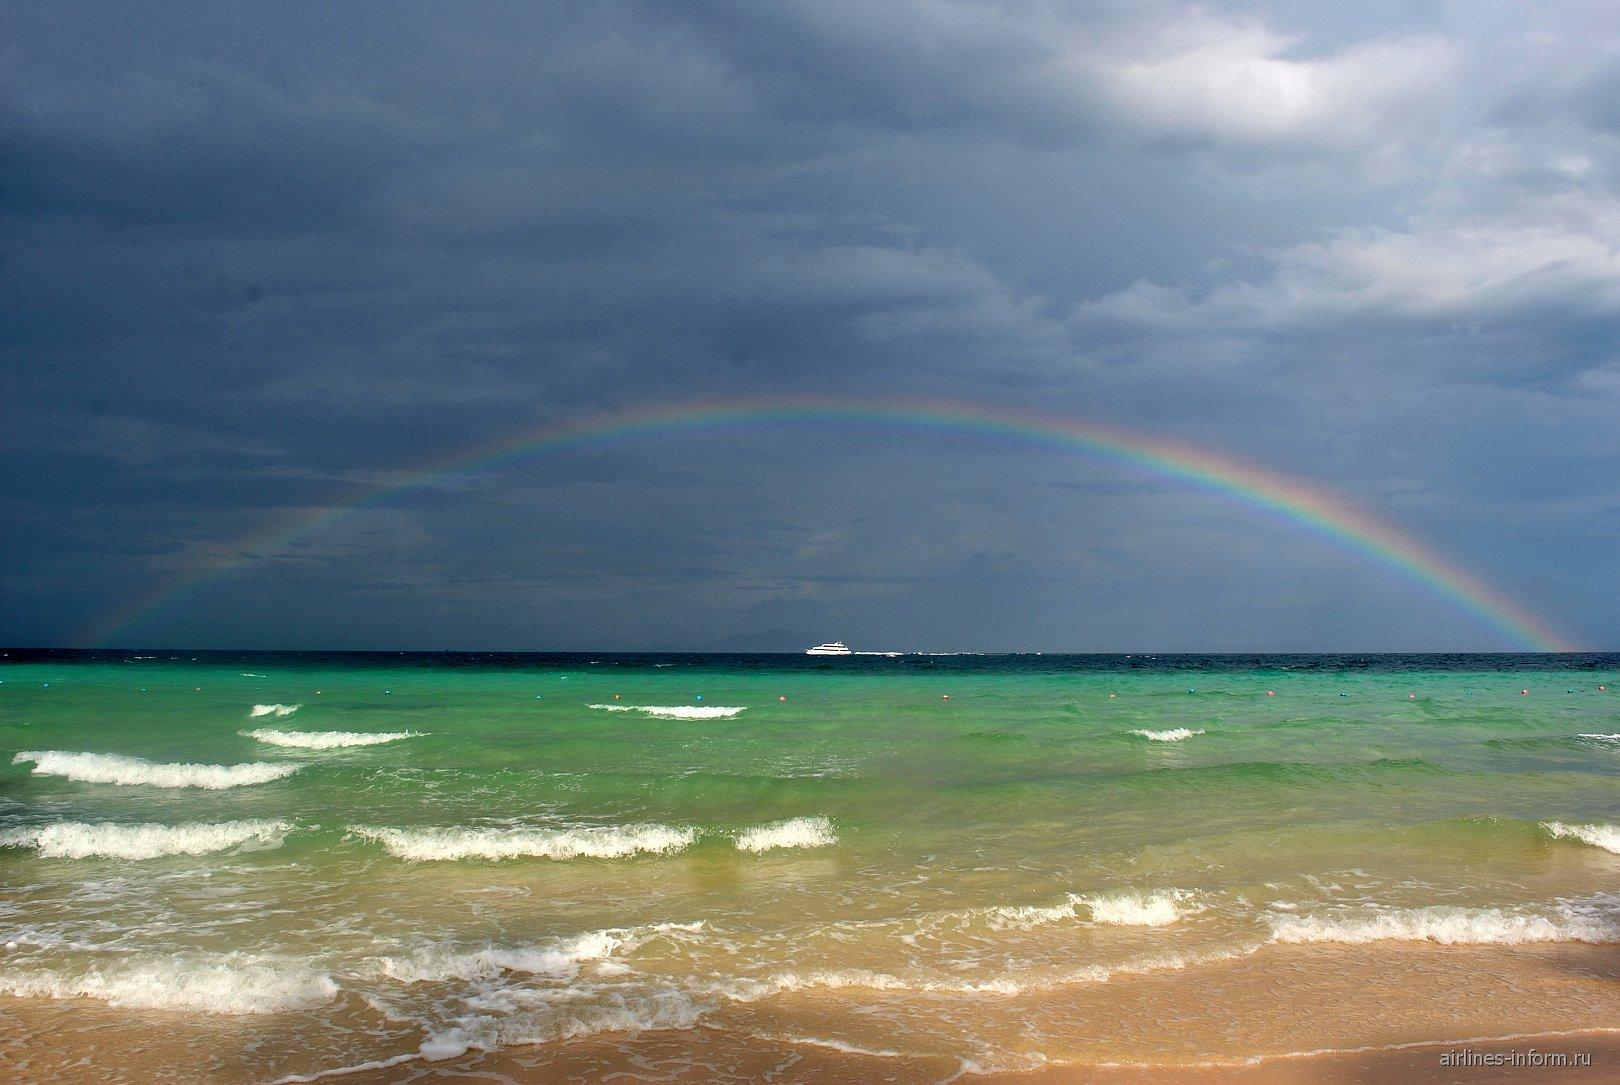 Вечернее небо и радуга над Адаманским морем